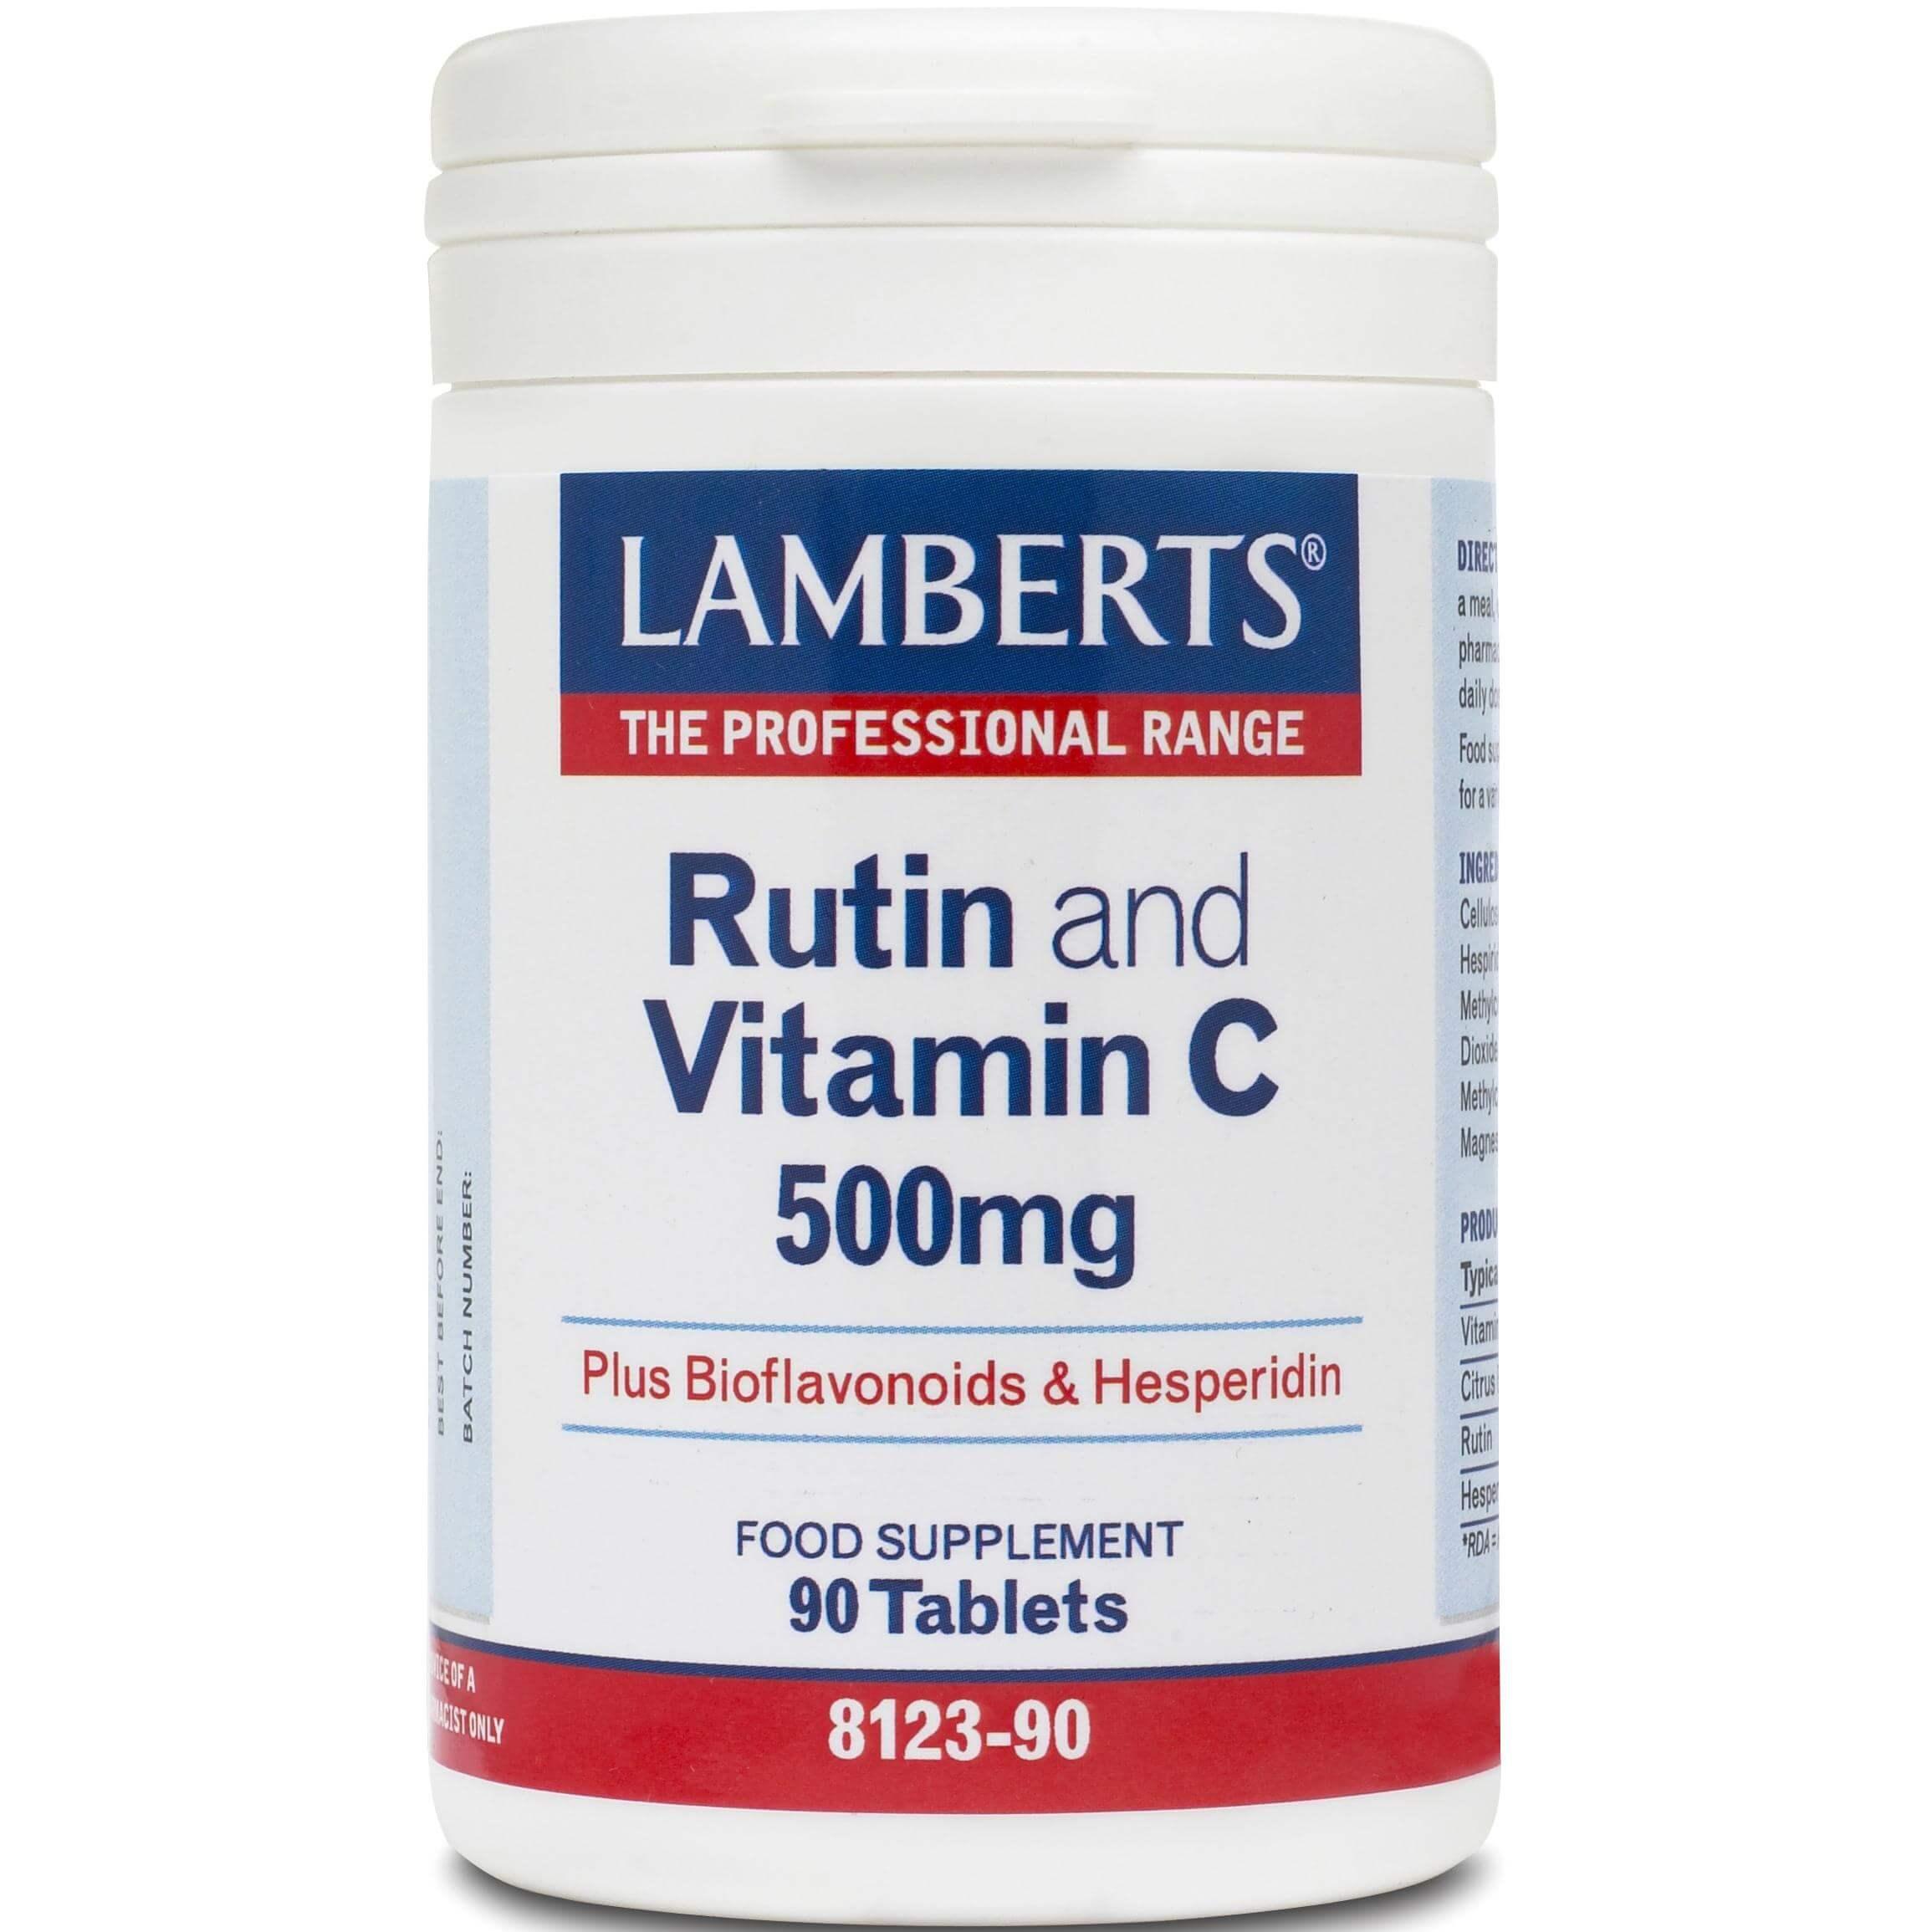 Lamberts Rutin & C & Bioflavonoids Βιταμίνη C και Βιοφλαβονοειδή 90tabs